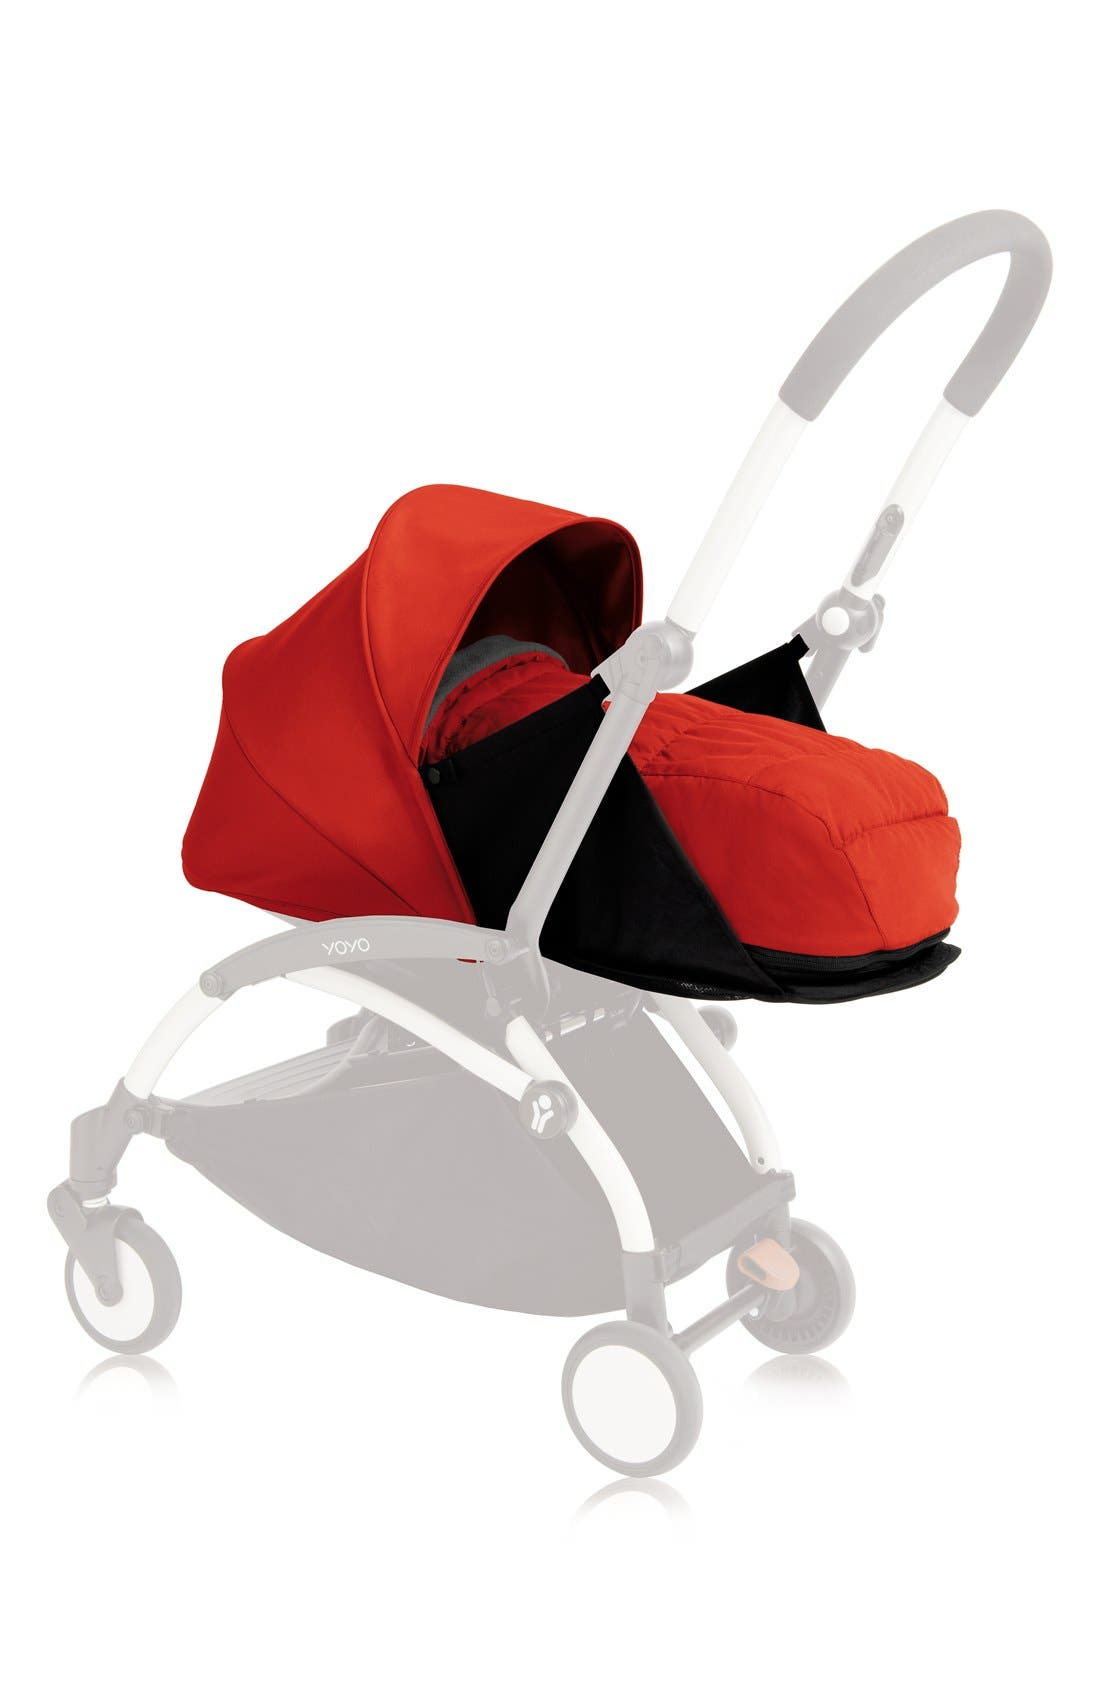 'YOYO+' Newborn Pack,                         Main,                         color, Red